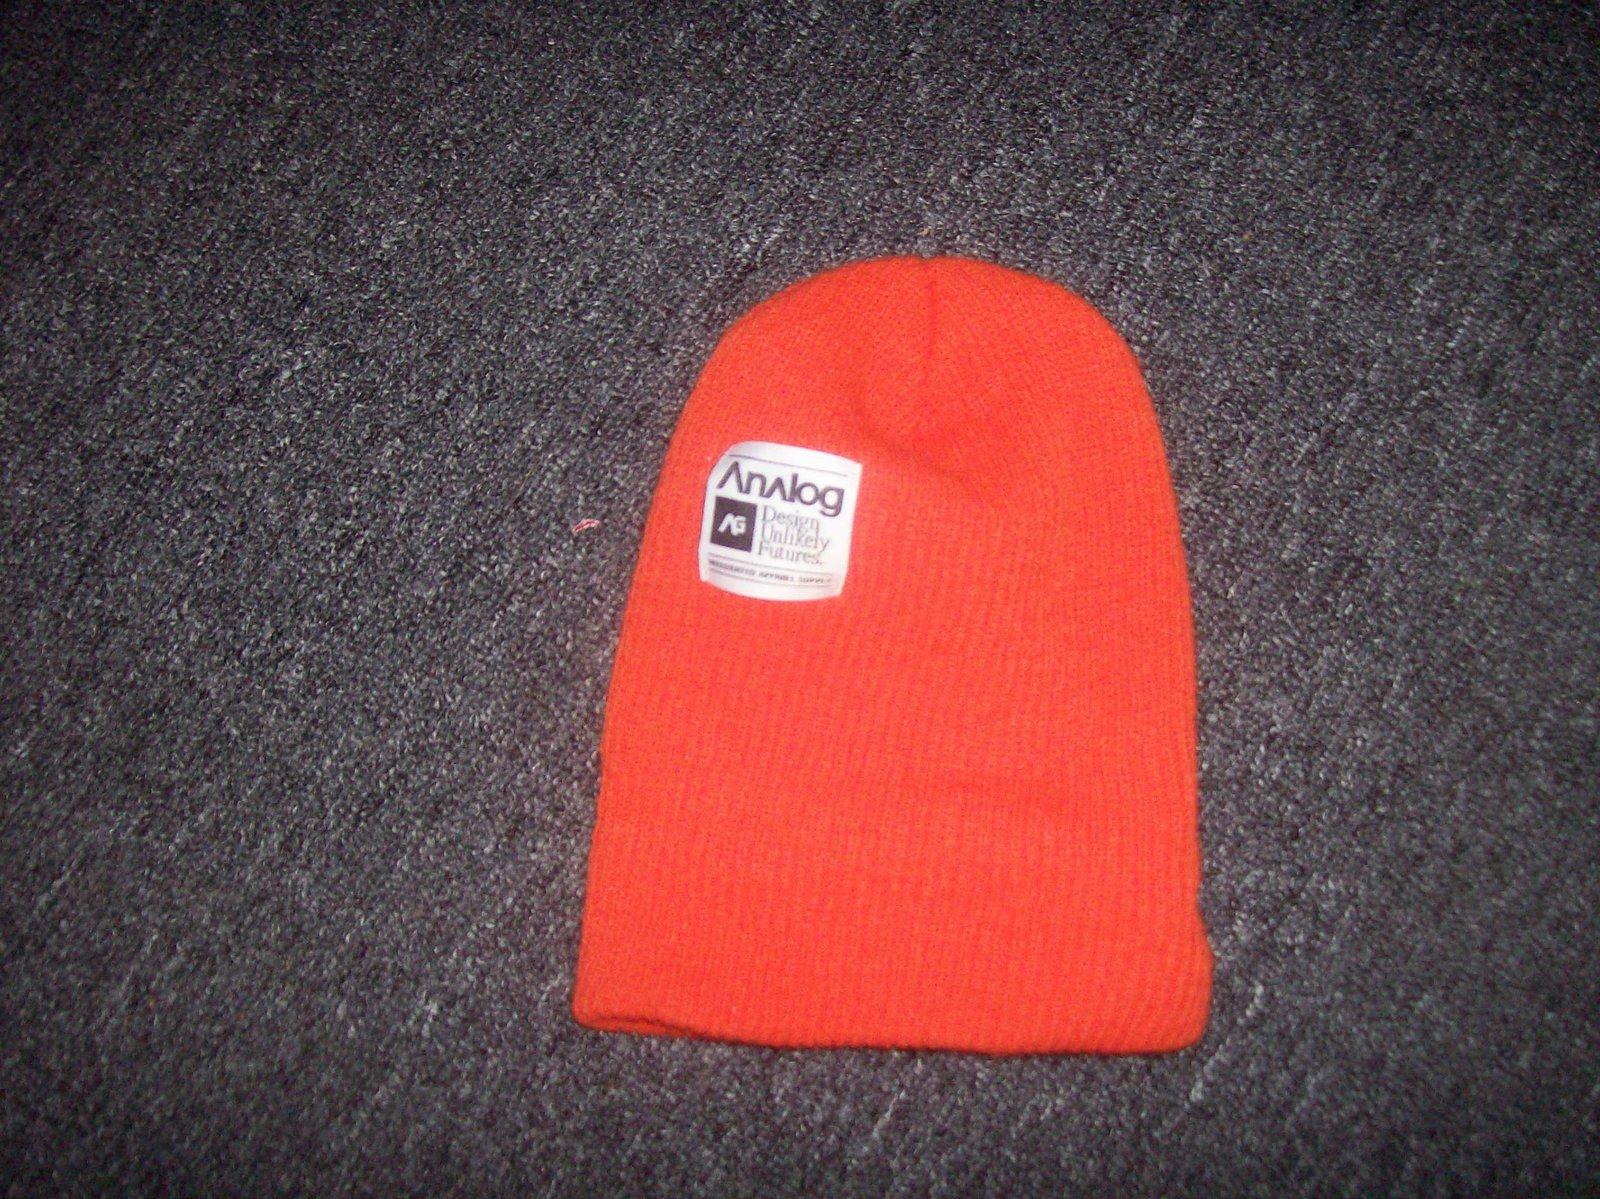 analog hat sale